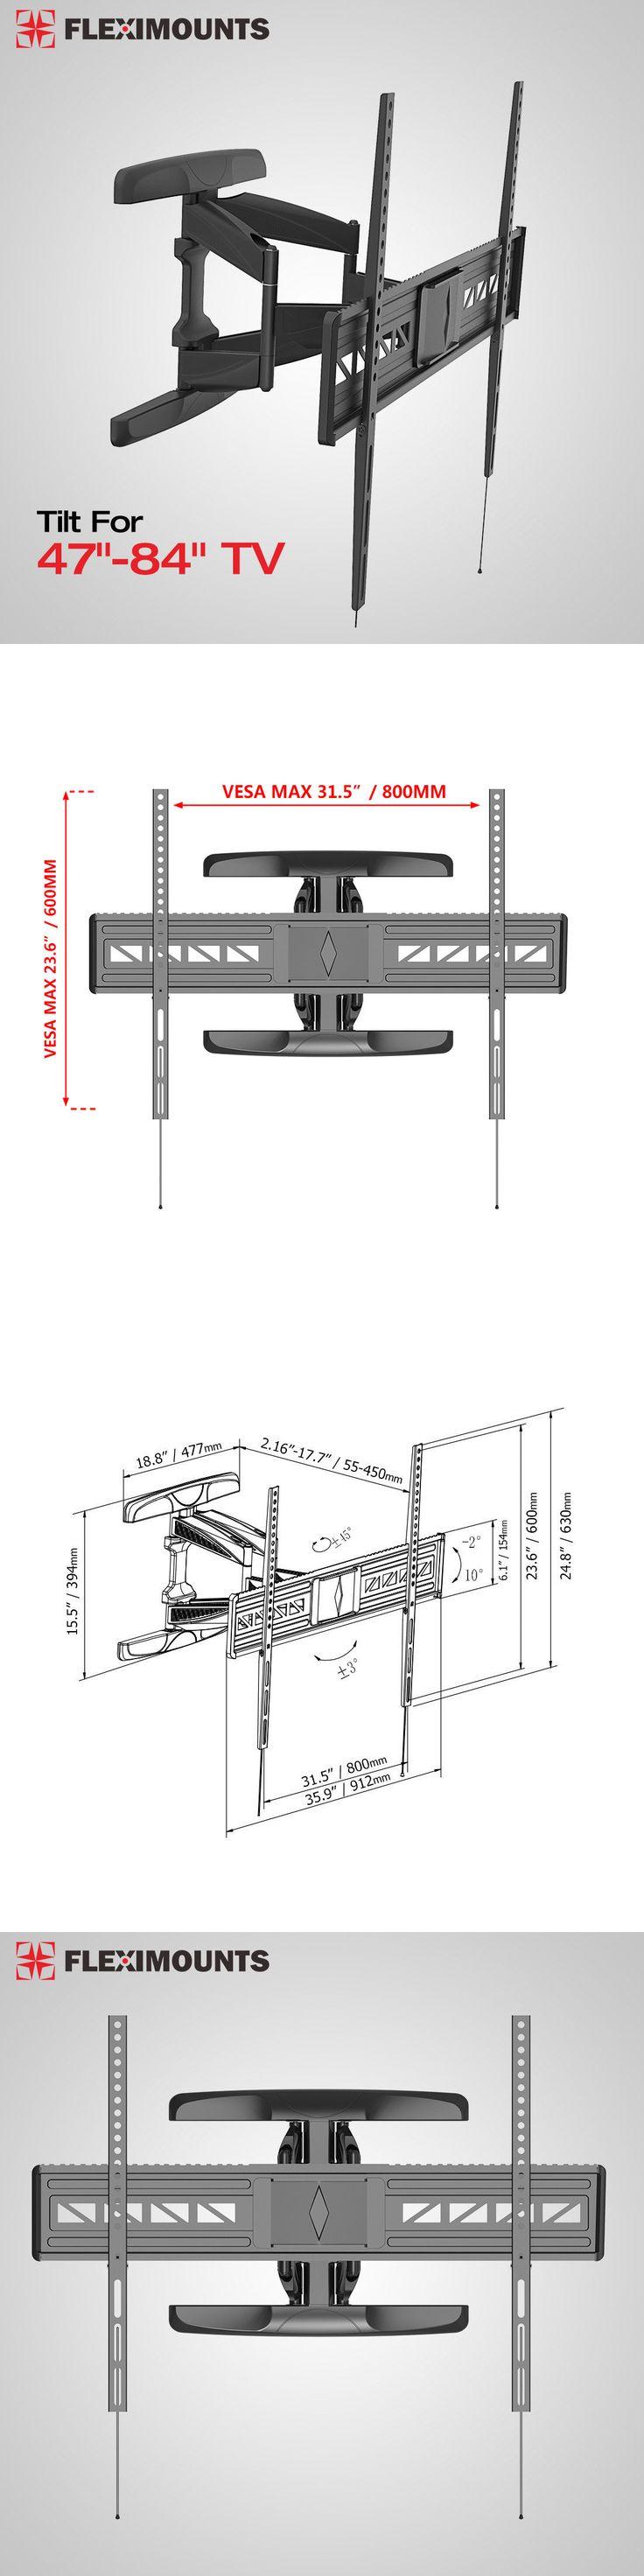 TV Mounts and Brackets: Articulating Tilt Oled Led Hd Tv Wall Mount Bracket 47 65 70 80 84 For Samsung BUY IT NOW ONLY: $74.99